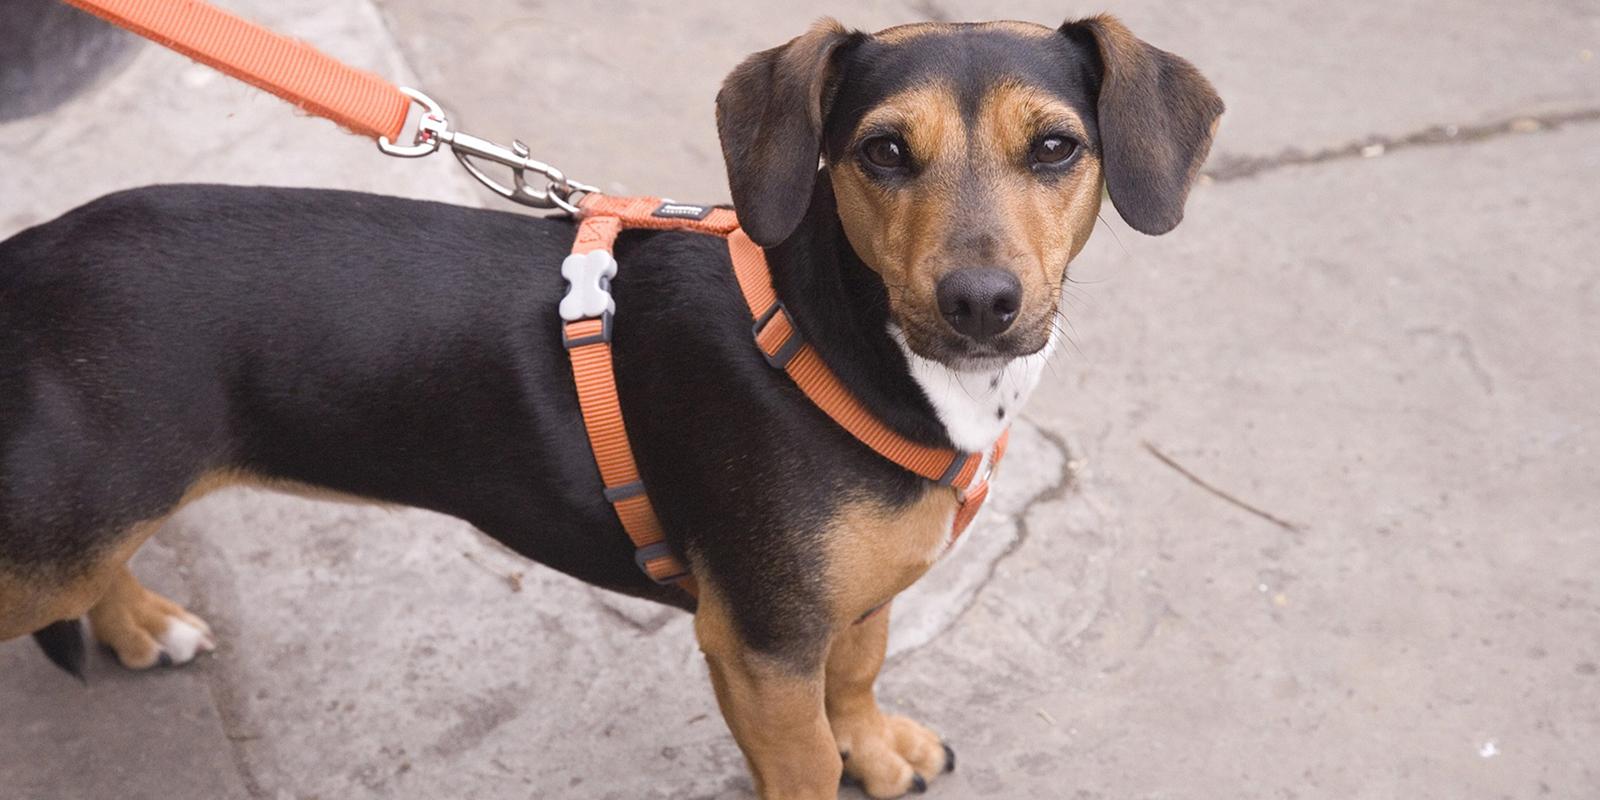 Respect The Lead - The Friendly Pet Nurse - Zoe Blake